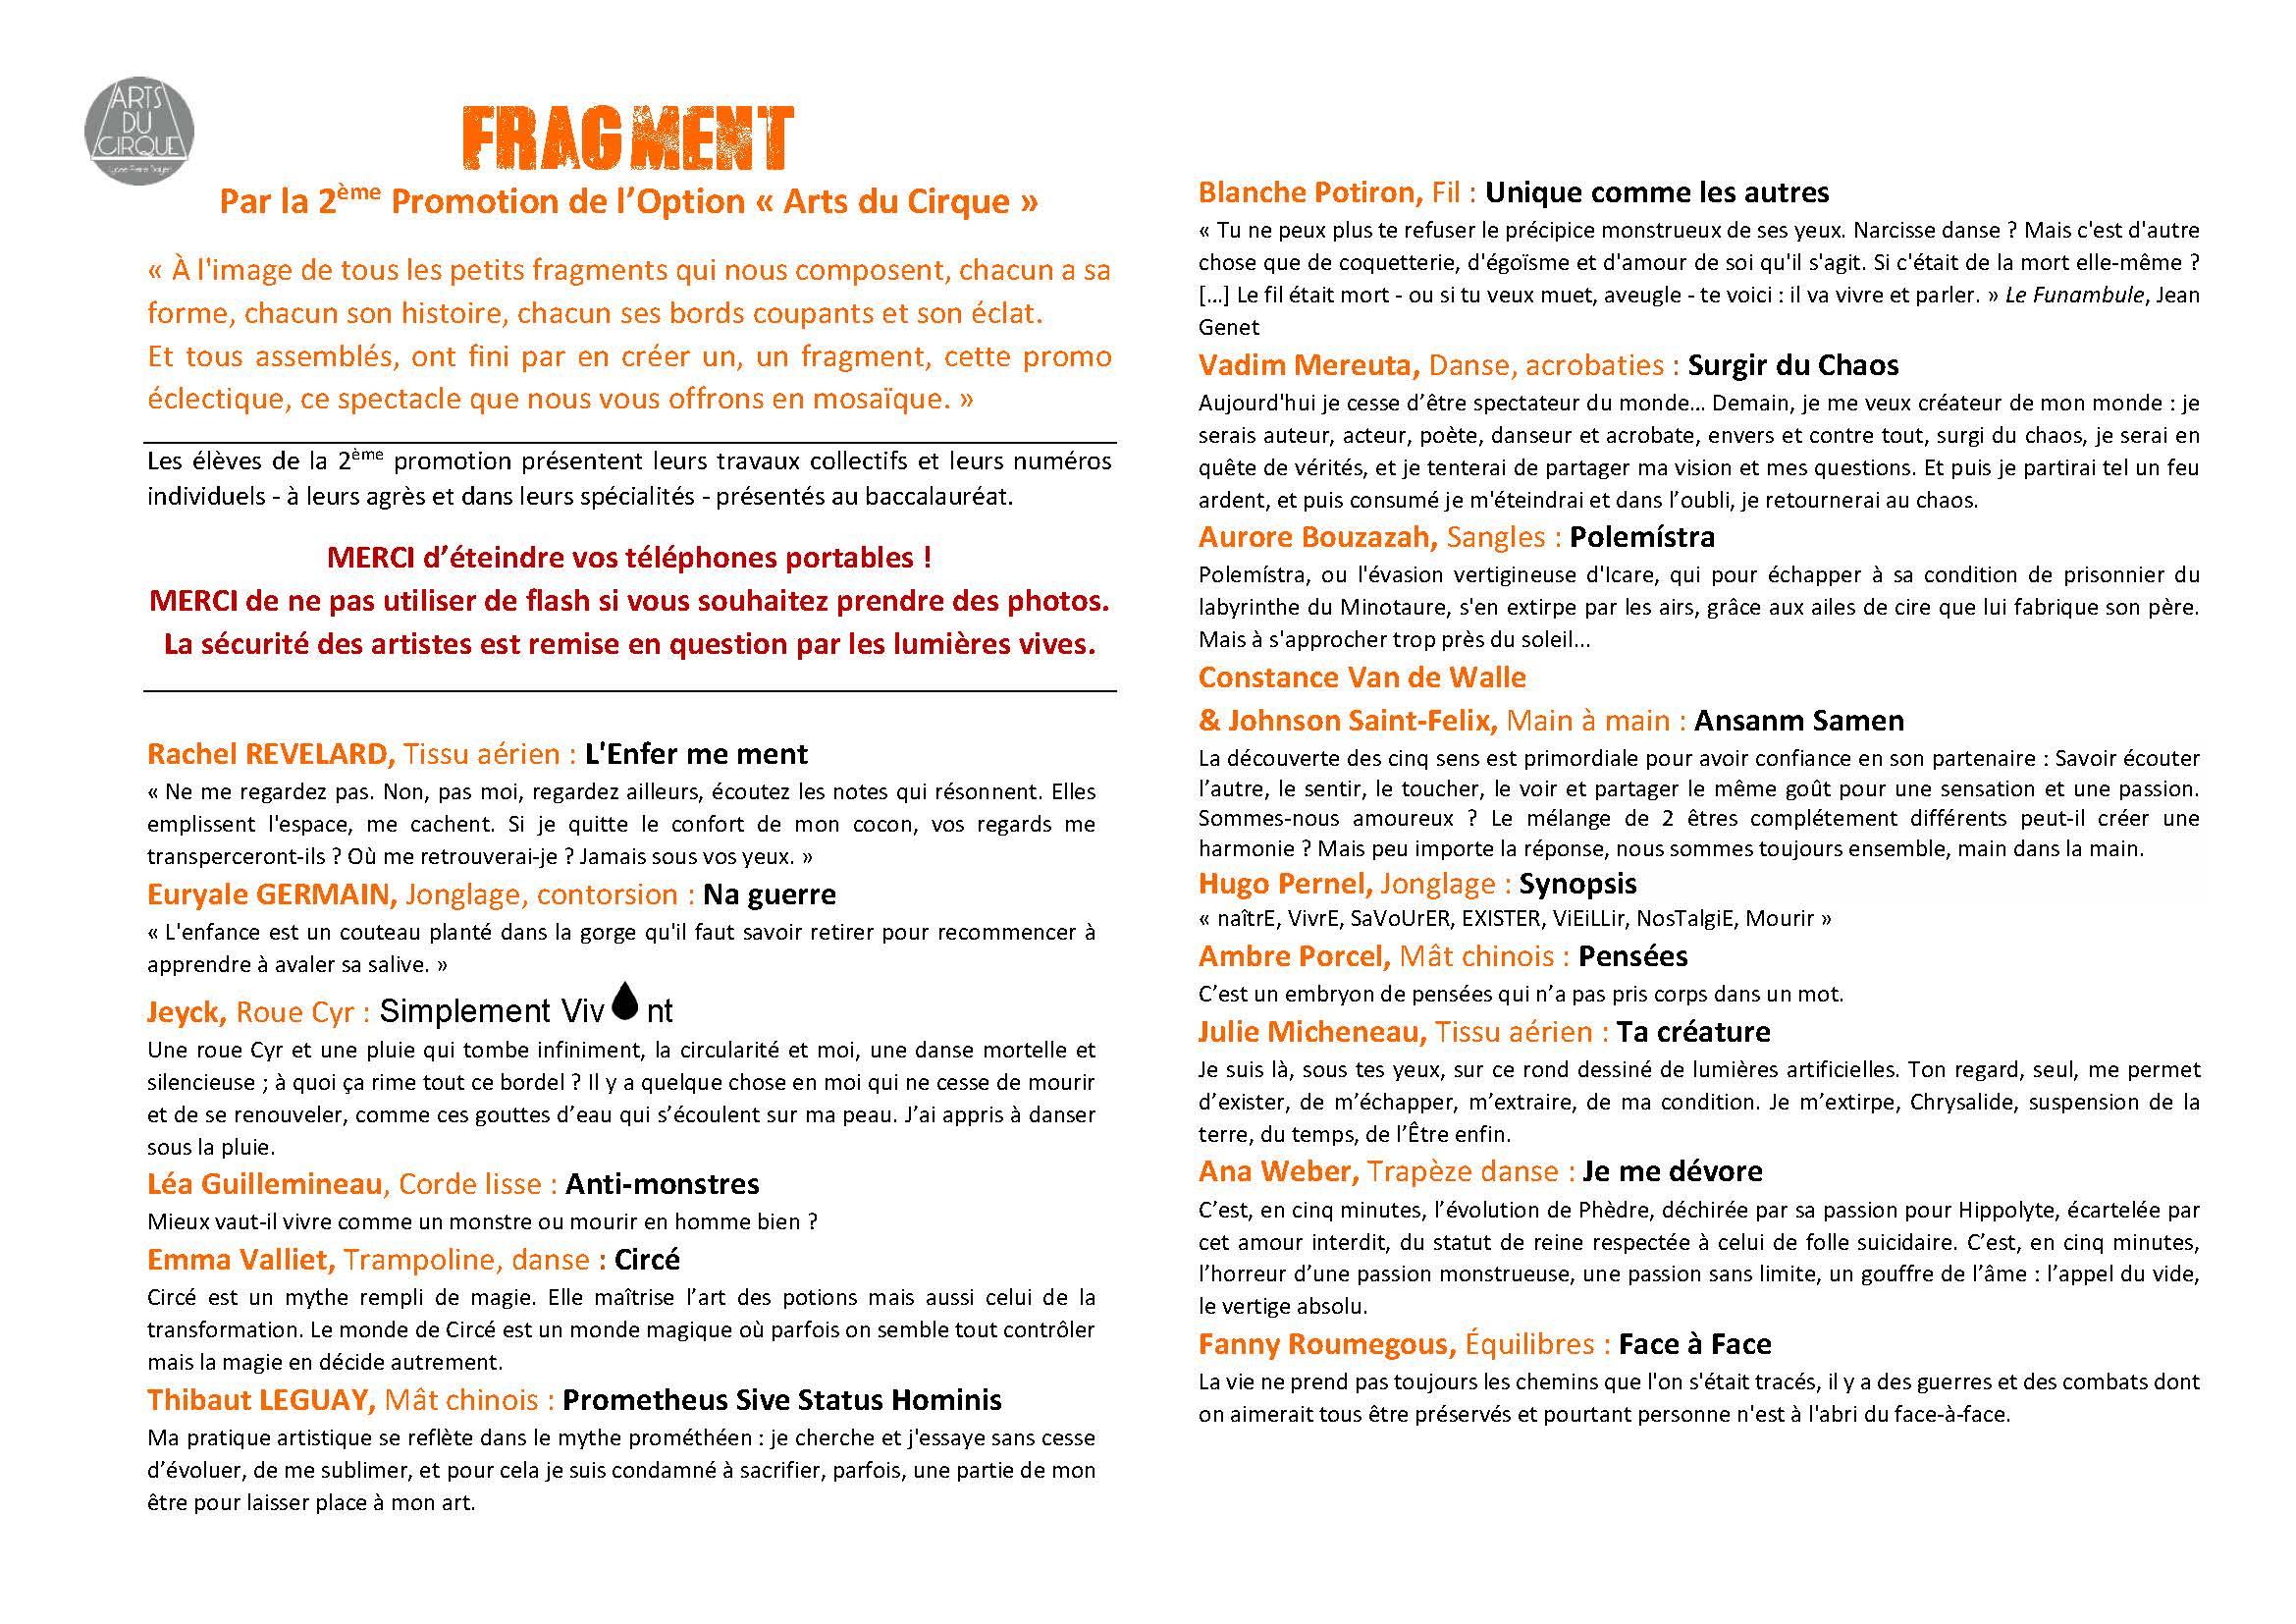 FRAGMENT - 12-05-16